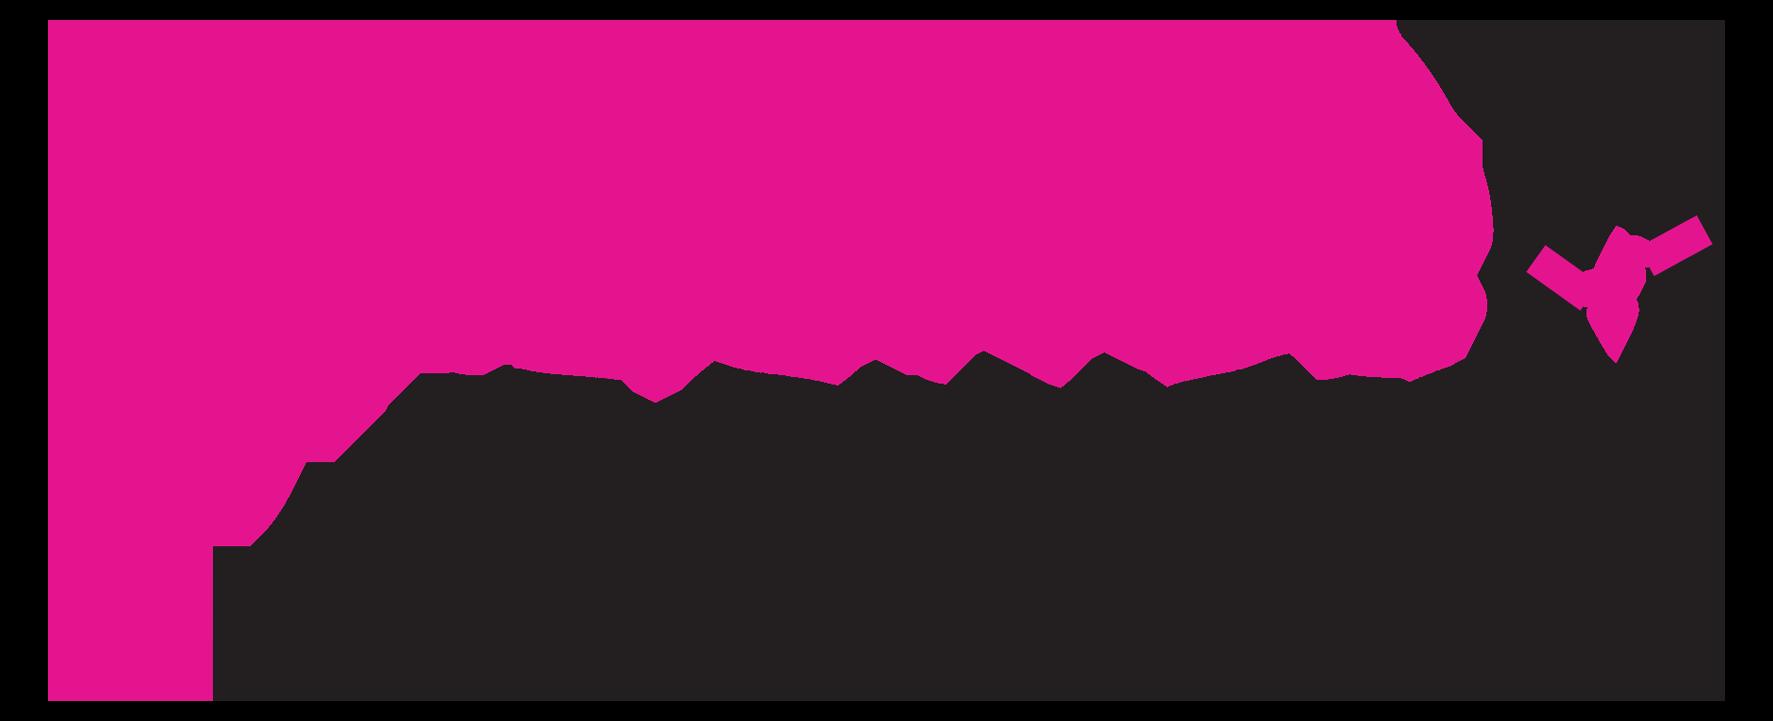 Influence 2 Power